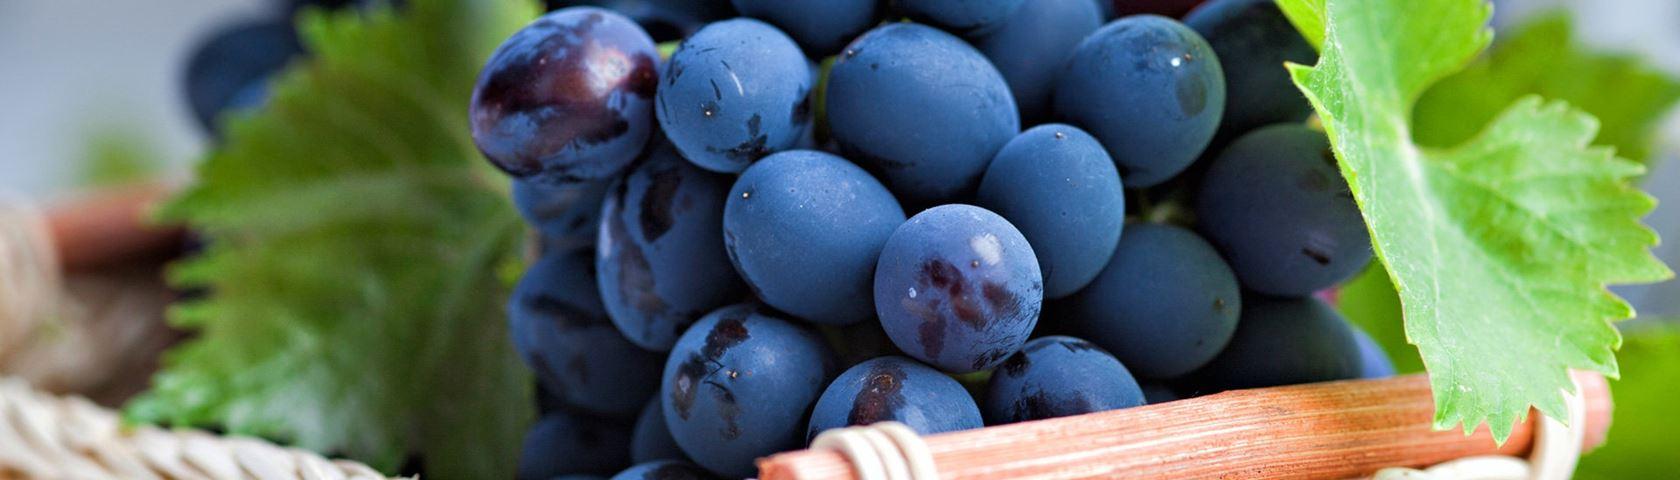 Plump Juicy Grapes